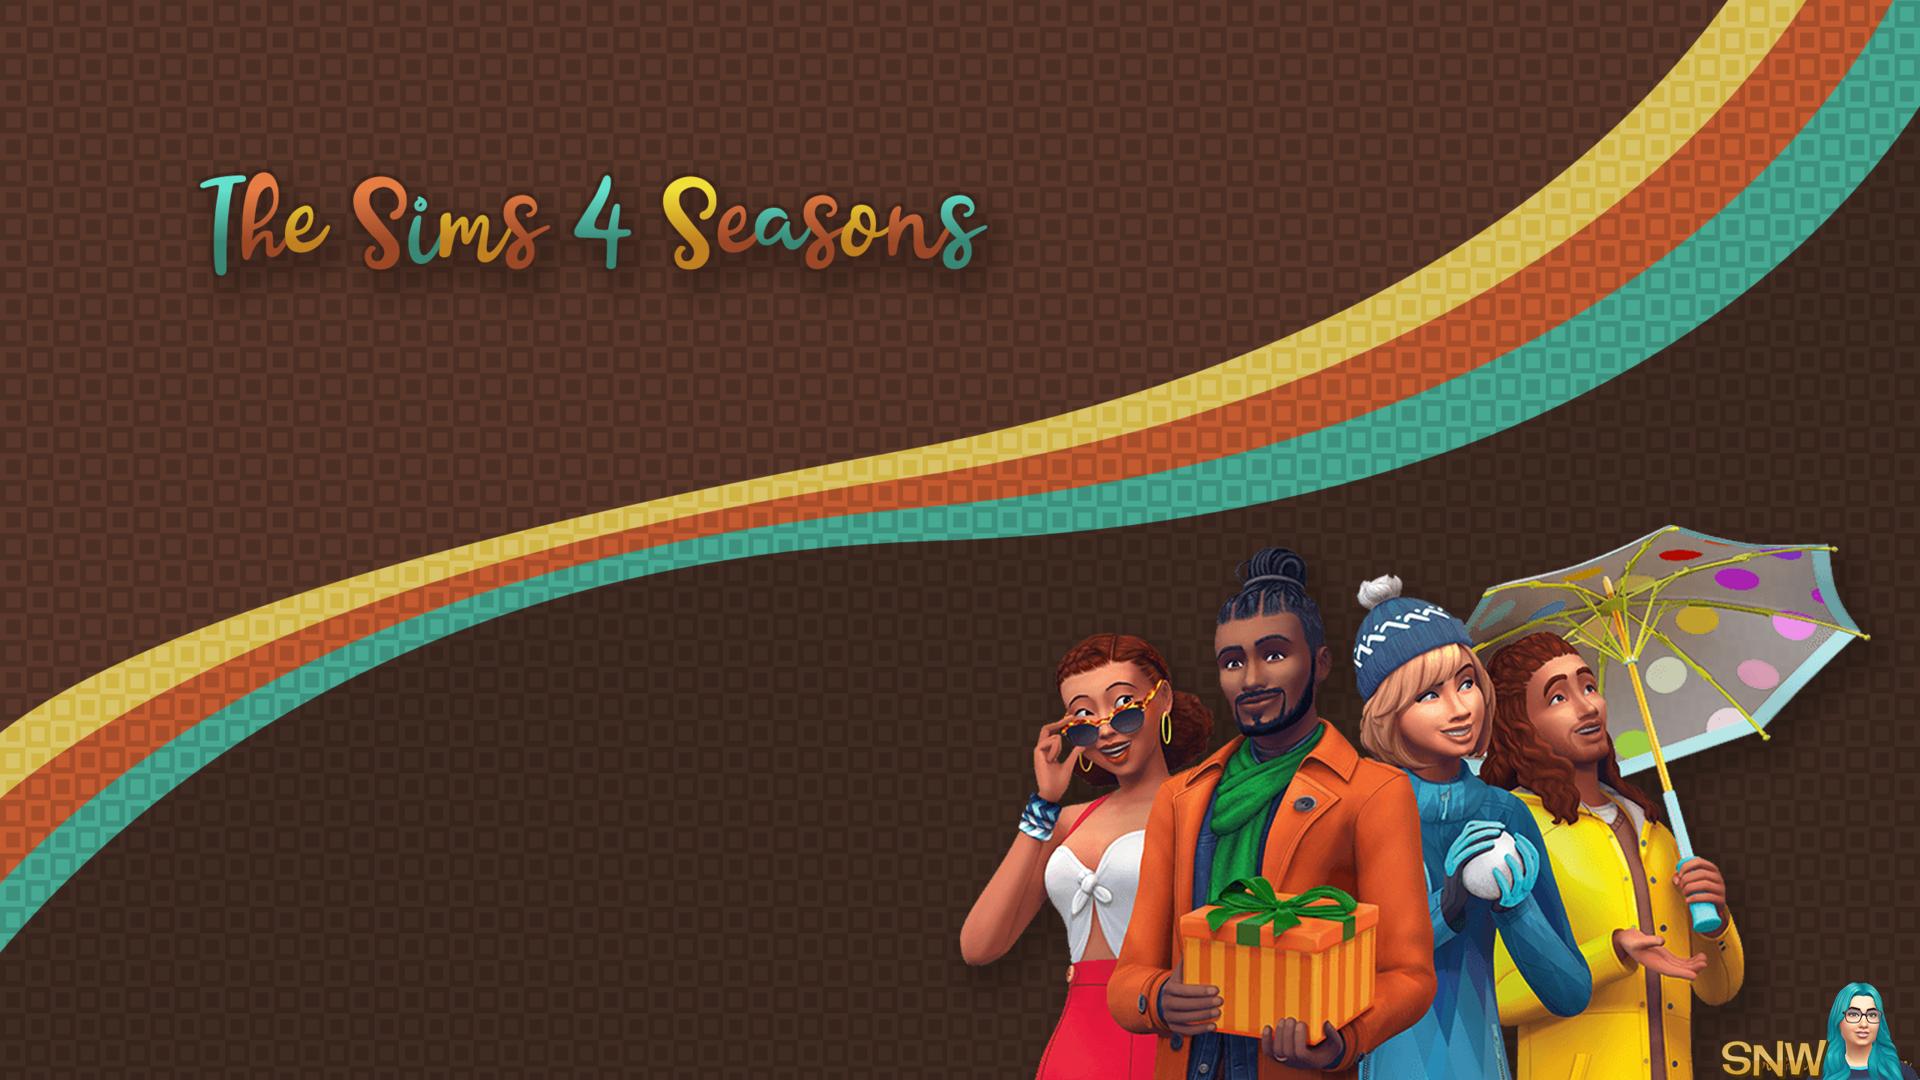 The Sims 4 Seasons Wallpaper Snw Mysimsnetworkcom